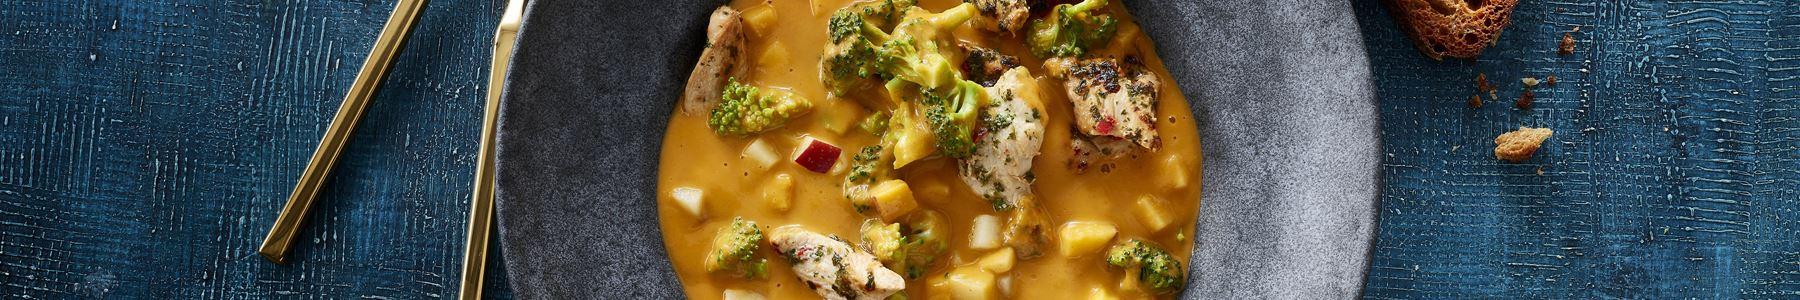 Fedtfattig + Broccoli + Varme supper + Forår